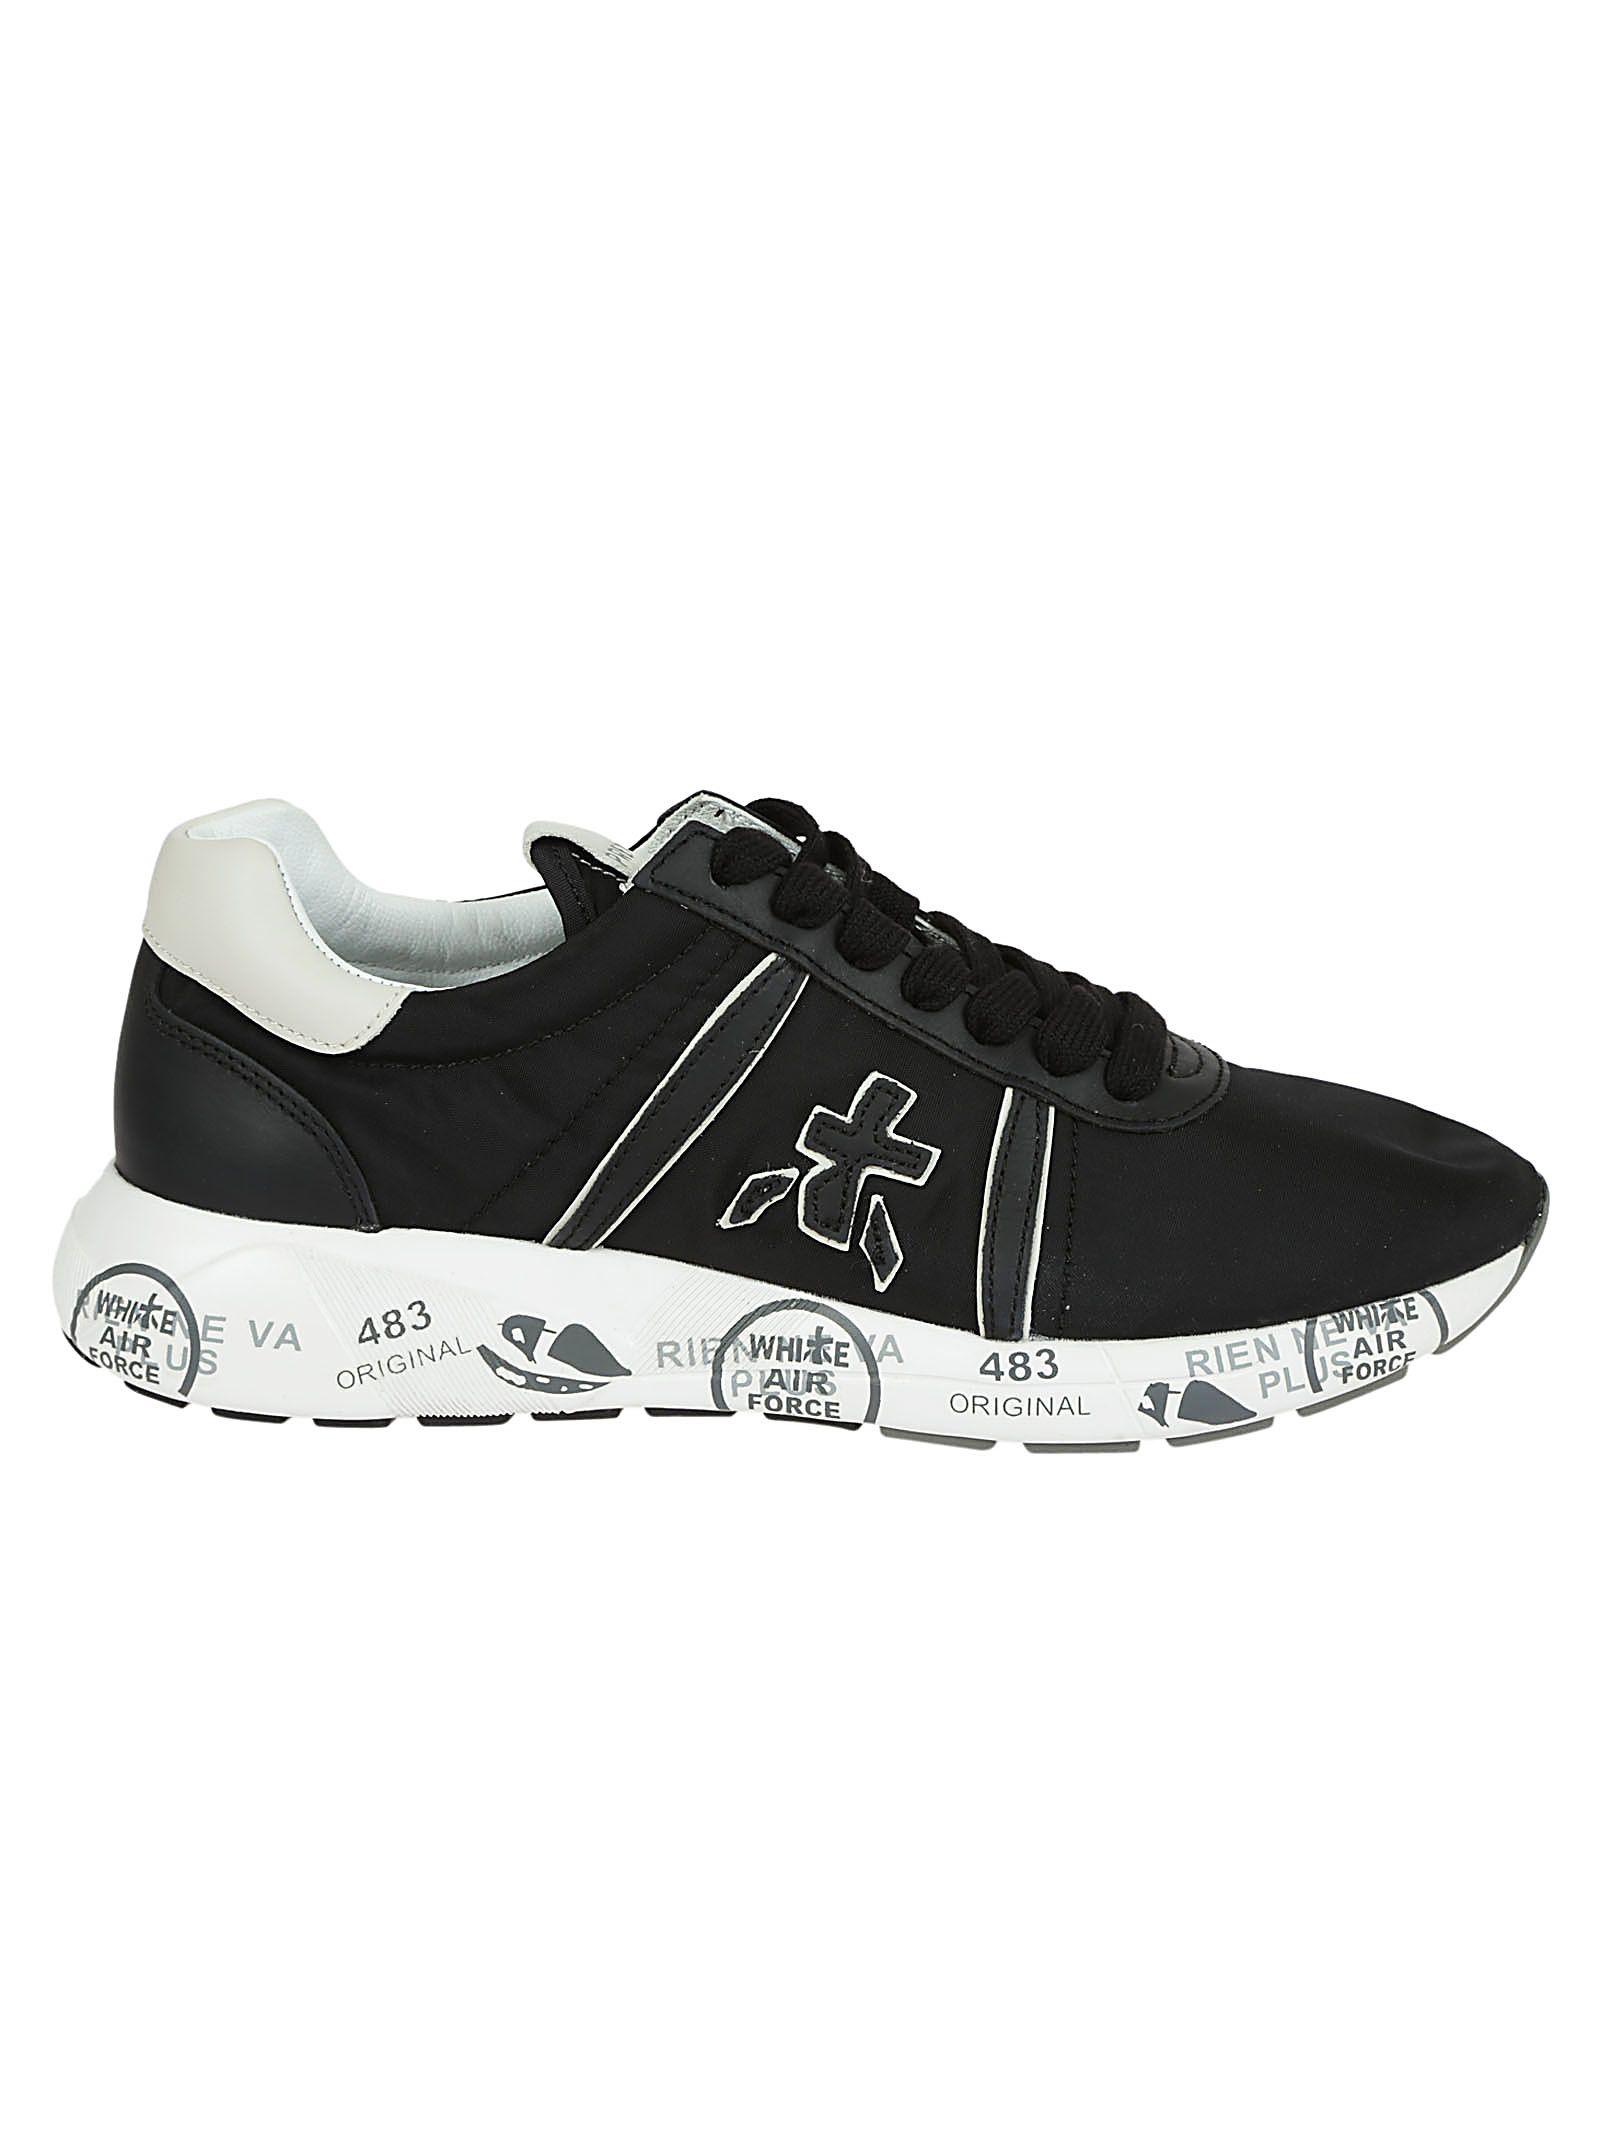 Premiata Mattew Sneakers ...